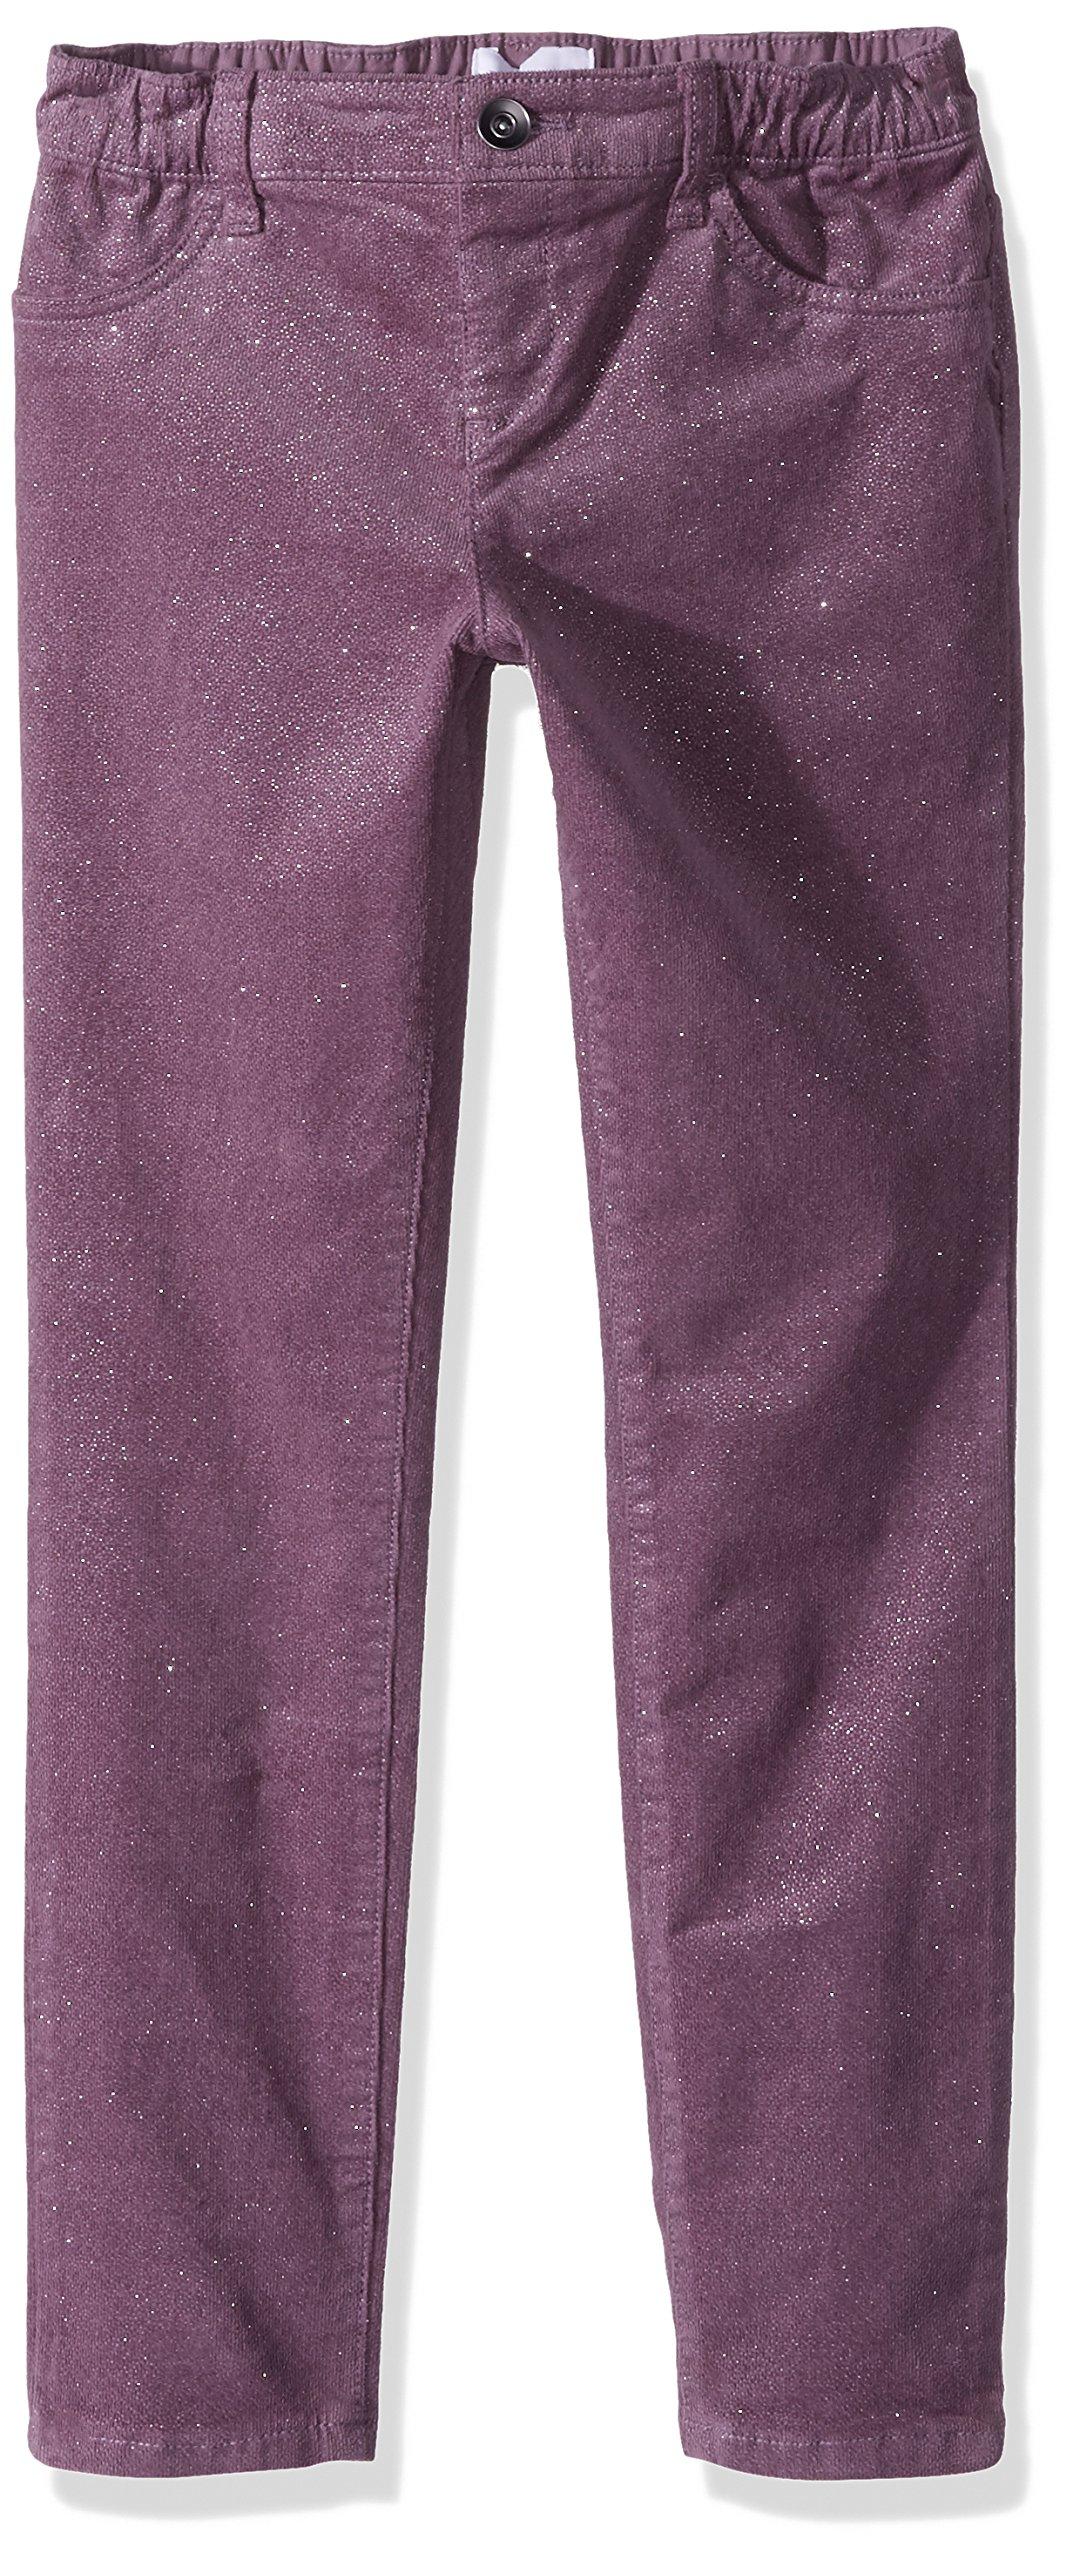 The Children's Place Big Girls' Fashion Pants, Black Tulip 88468, 8